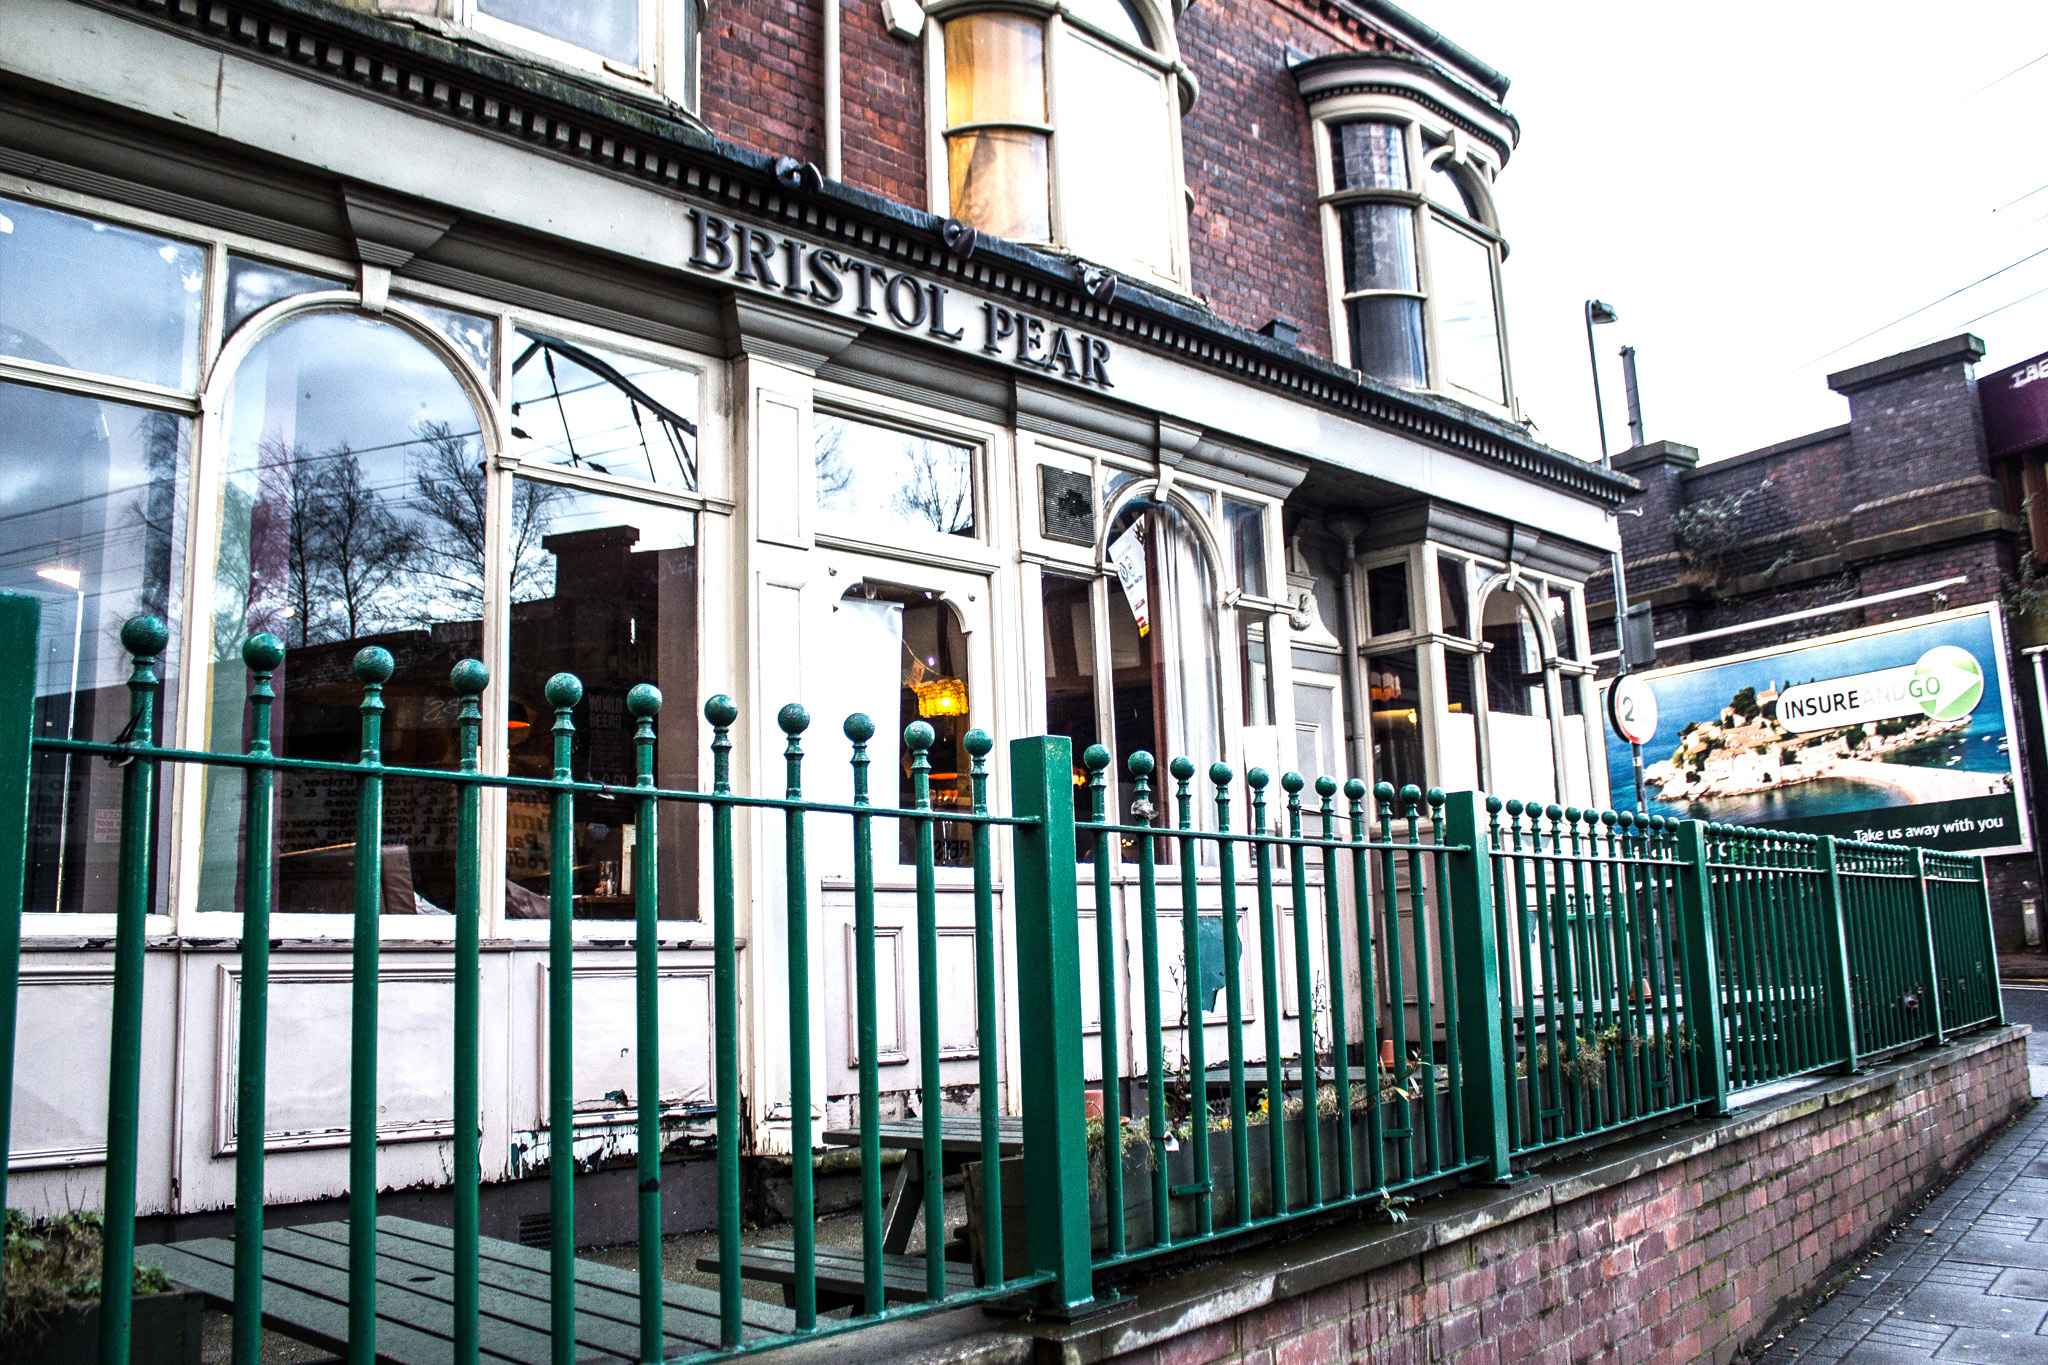 The Bristol Pear, pub